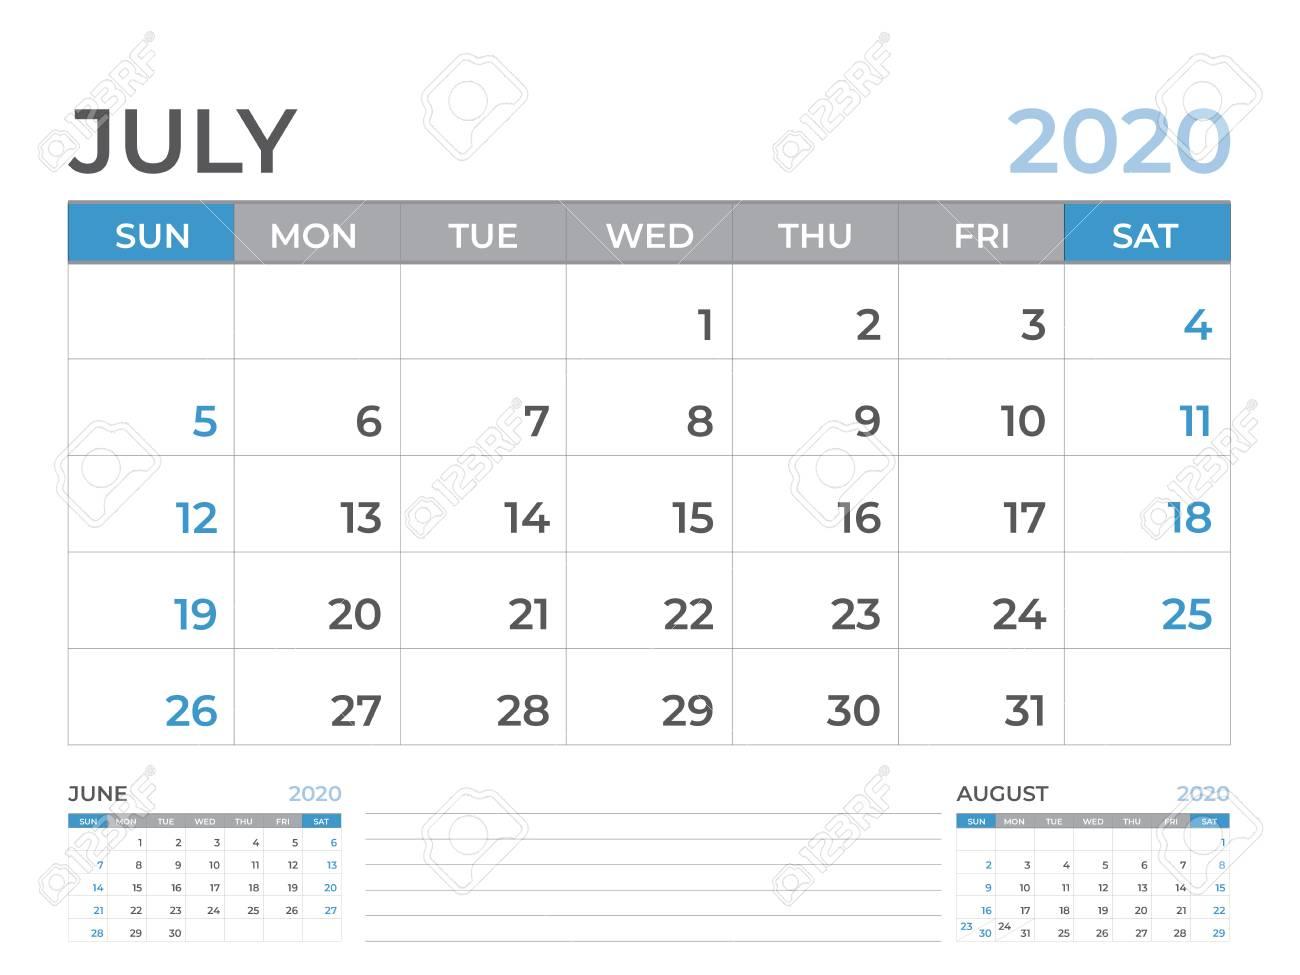 June 2020 Calendar Template, Desk Calendar Layout Size 8 X 6 Inch, Planner  Design, Week Starts On Sunday, Stationery Design, Vector Eps10 for 10 X 8 Planner Template